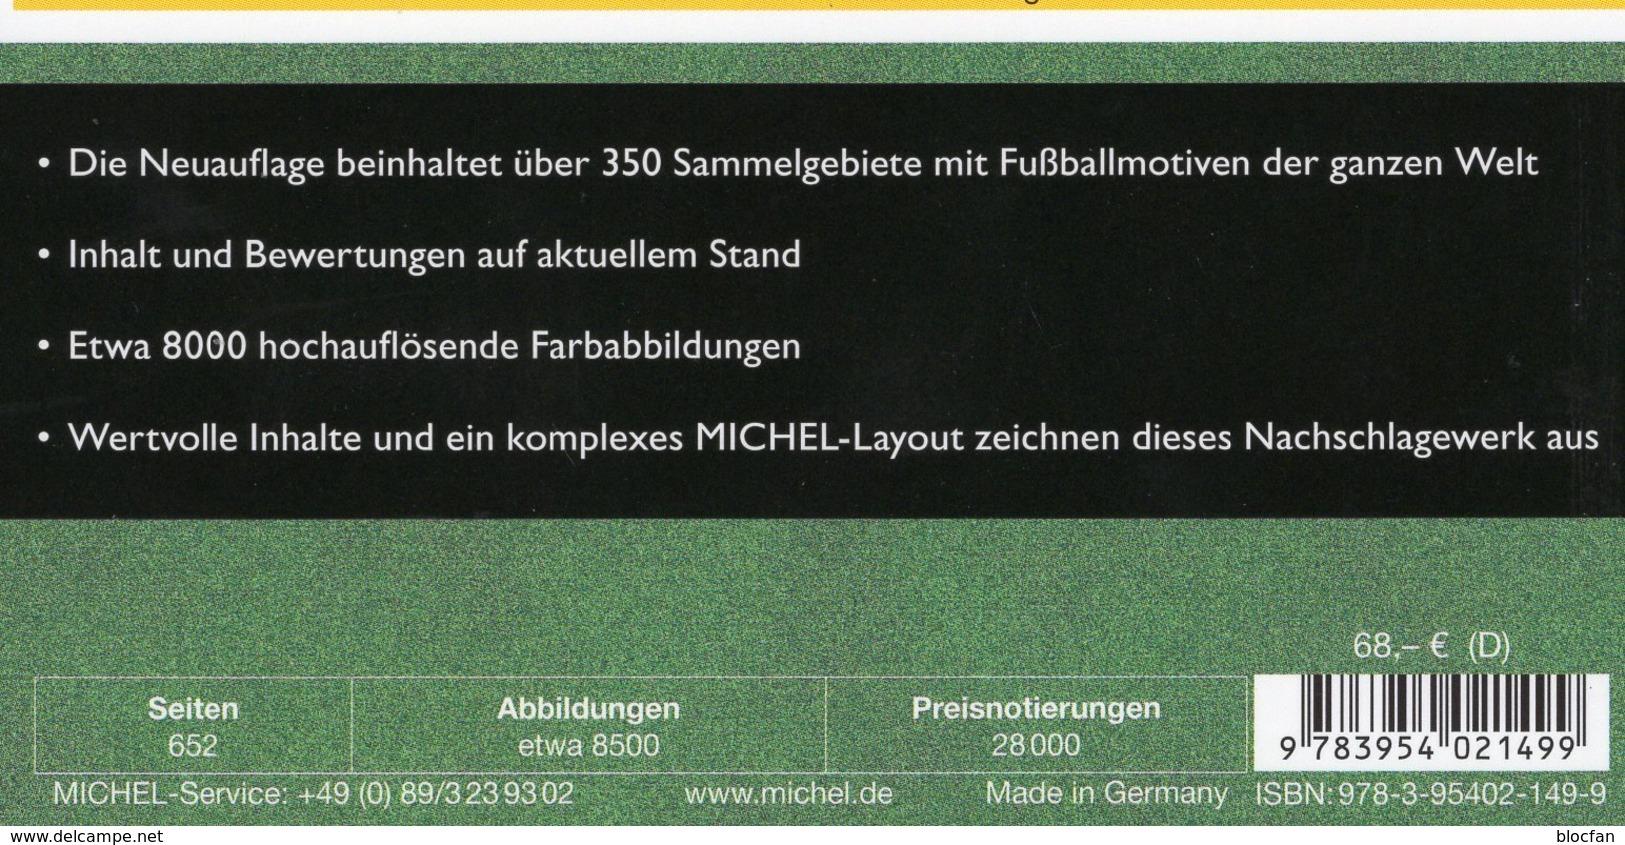 Fußball Catalogue MICHEL 2016 New 68€ Zur EM/Championat Fußballmarken Ganze Welt Topics Soccer Stamps Of The World - Saber